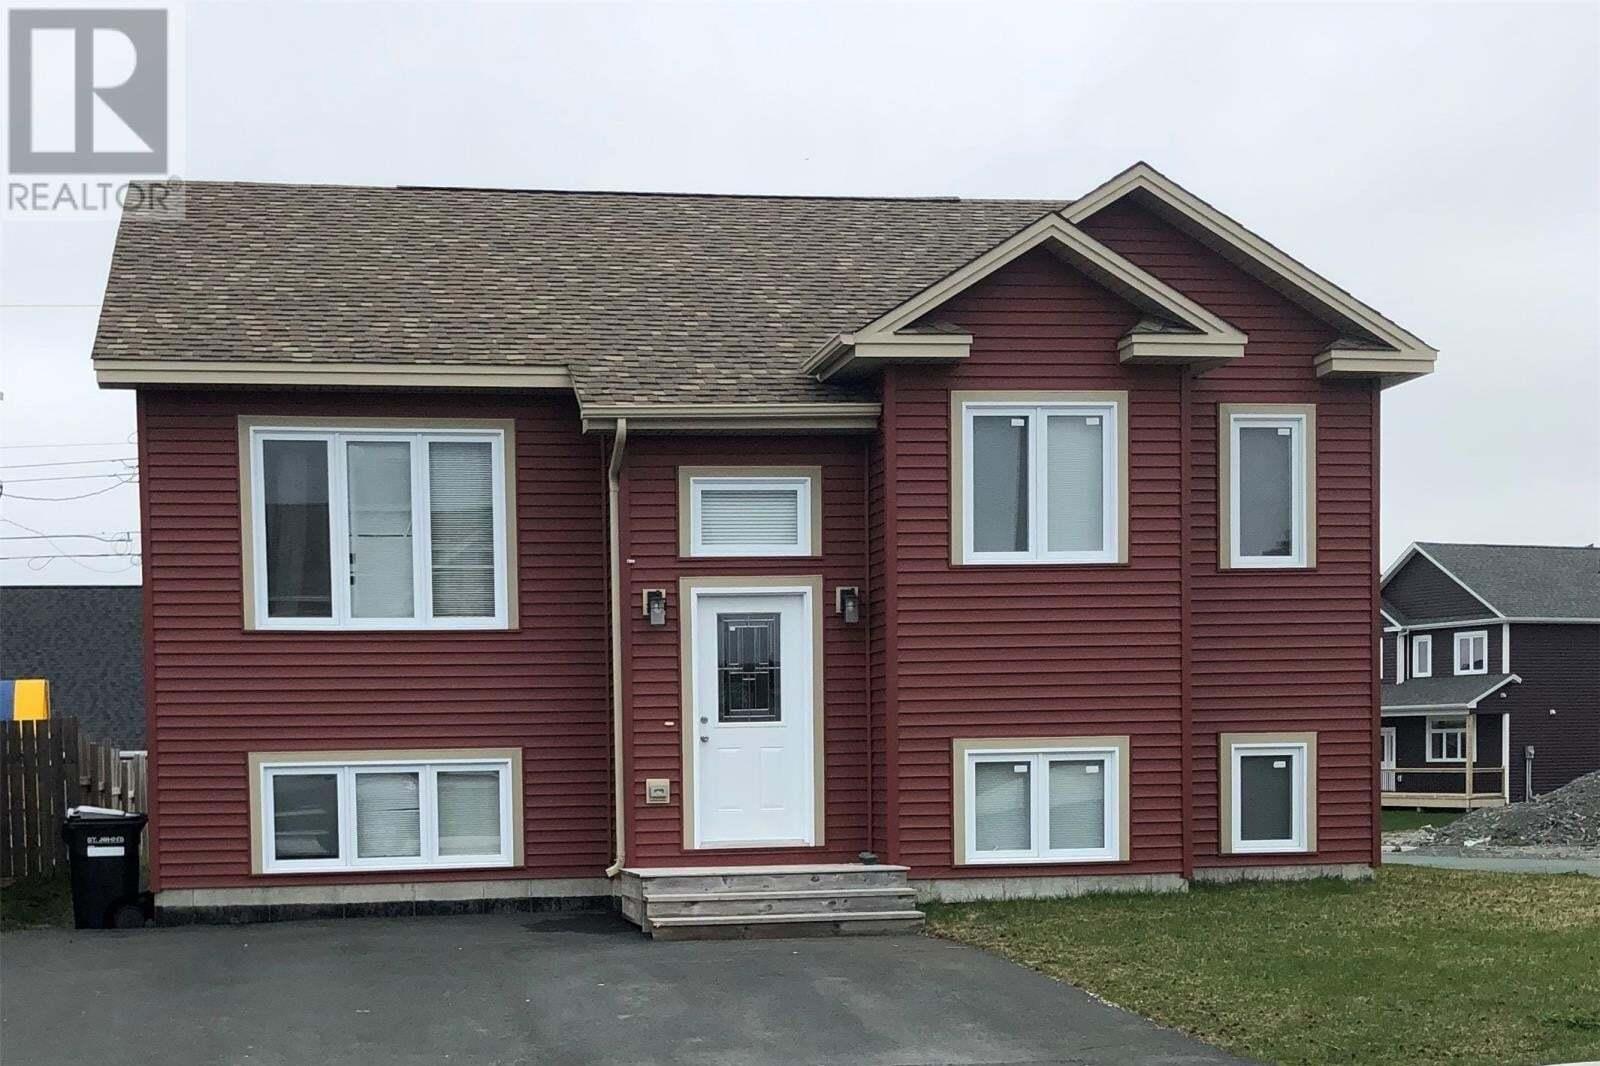 House for sale at 2 Bulrush Ave St. John's Newfoundland - MLS: 1214230